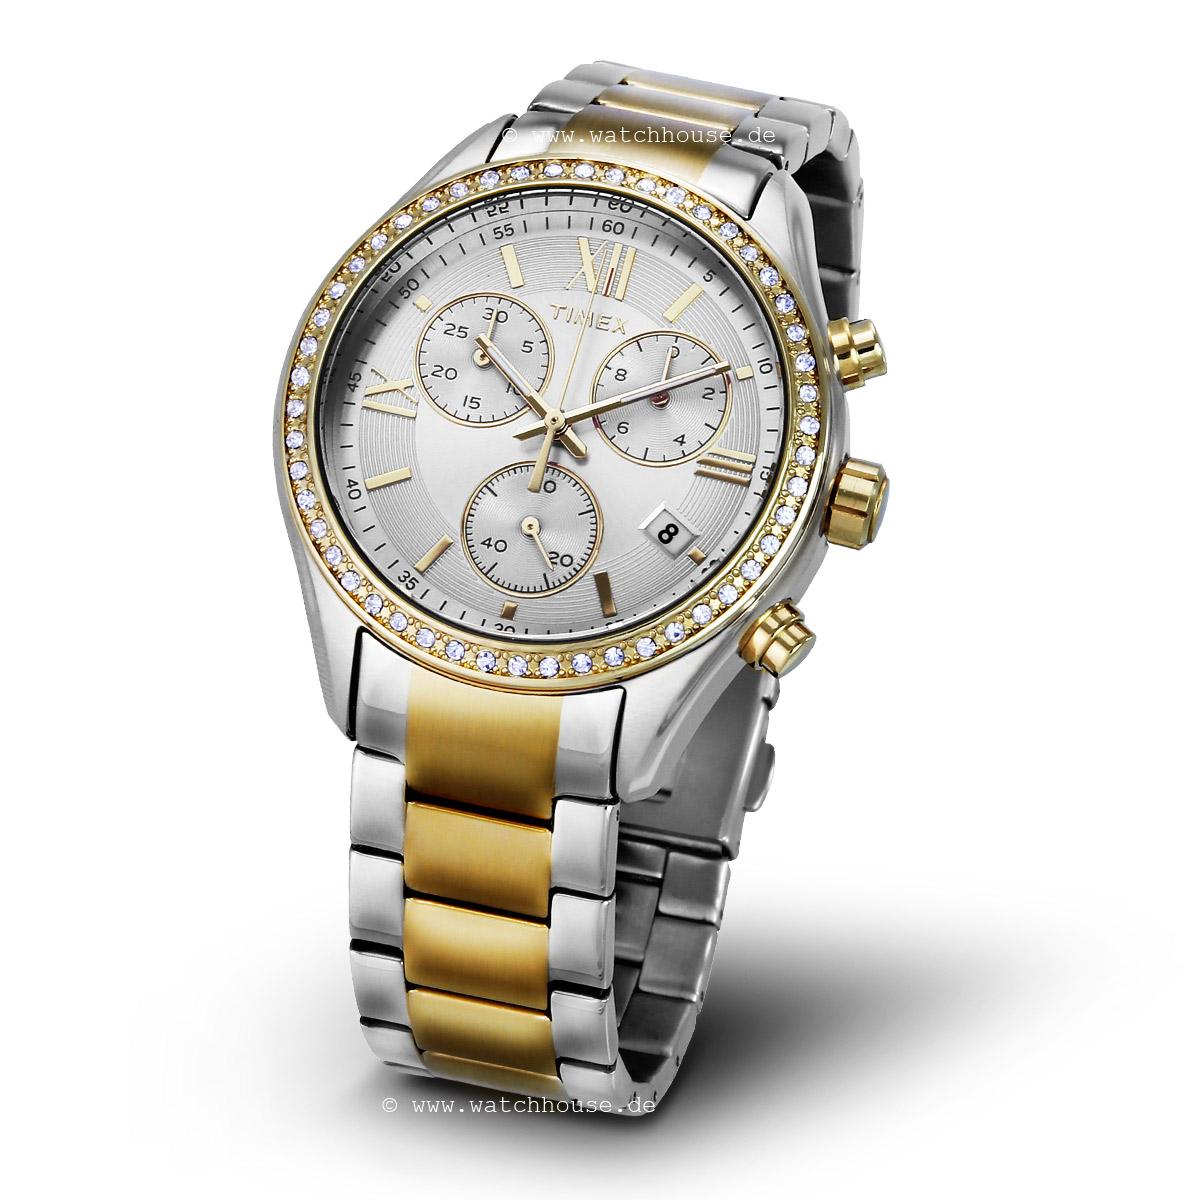 Timex Damen Chronograph TW2P67000 Armbanduhr